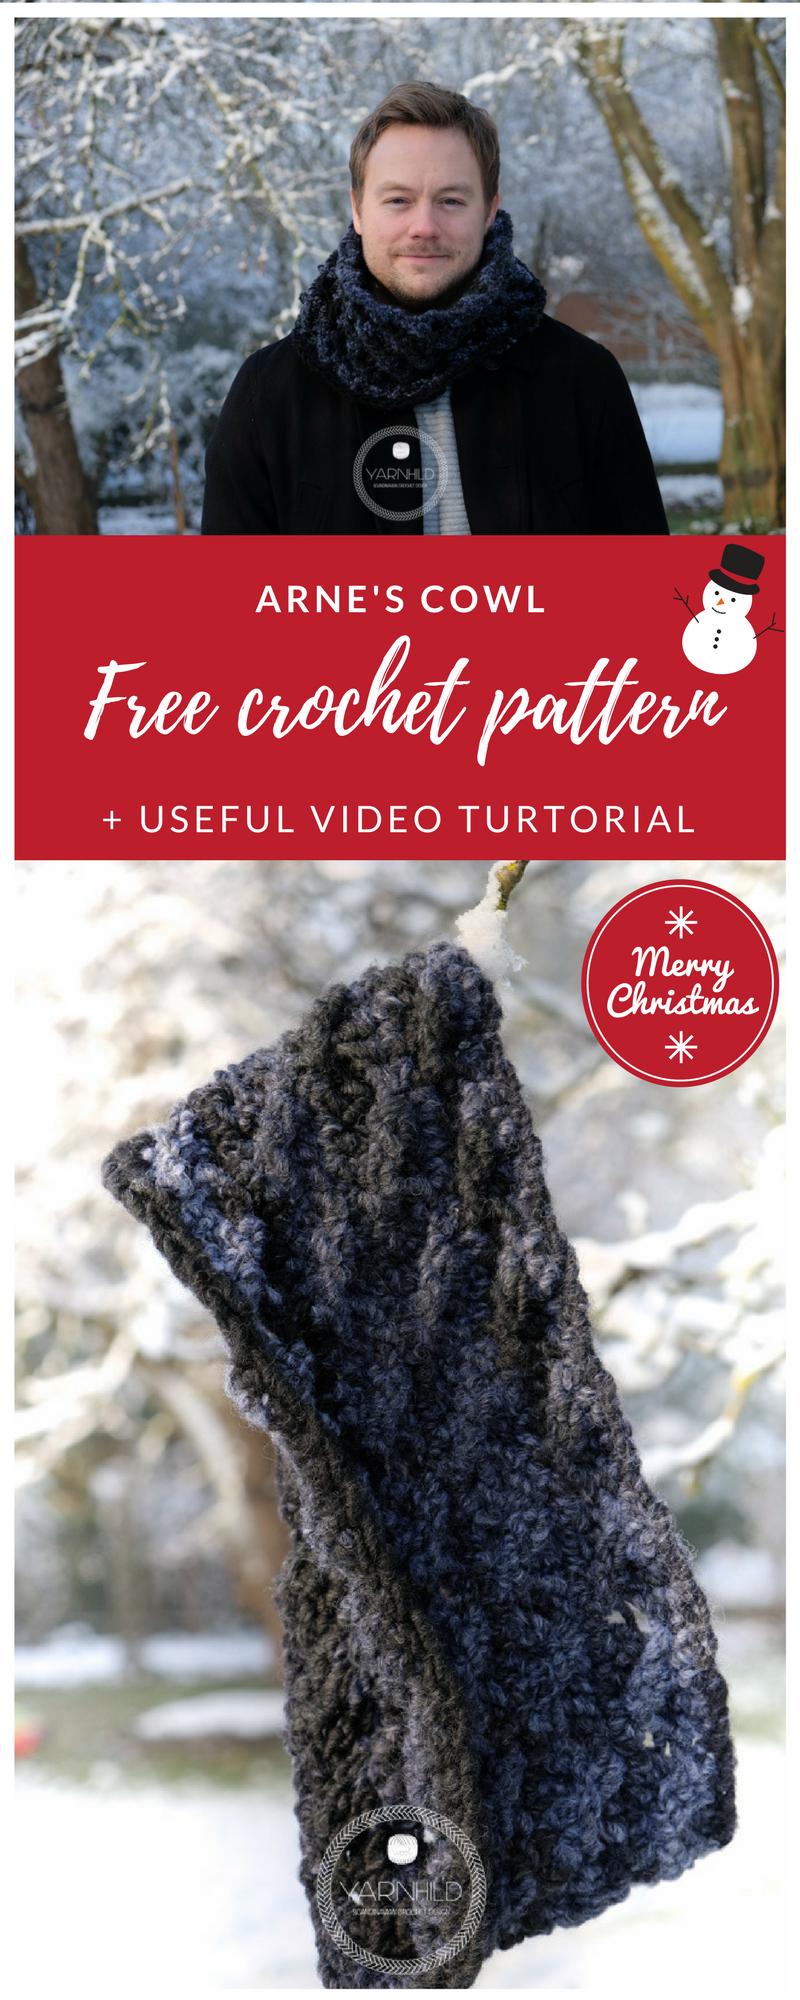 Crochet mens cowl - Free crochet pattern on Yarhnild.com | Pinterest ...